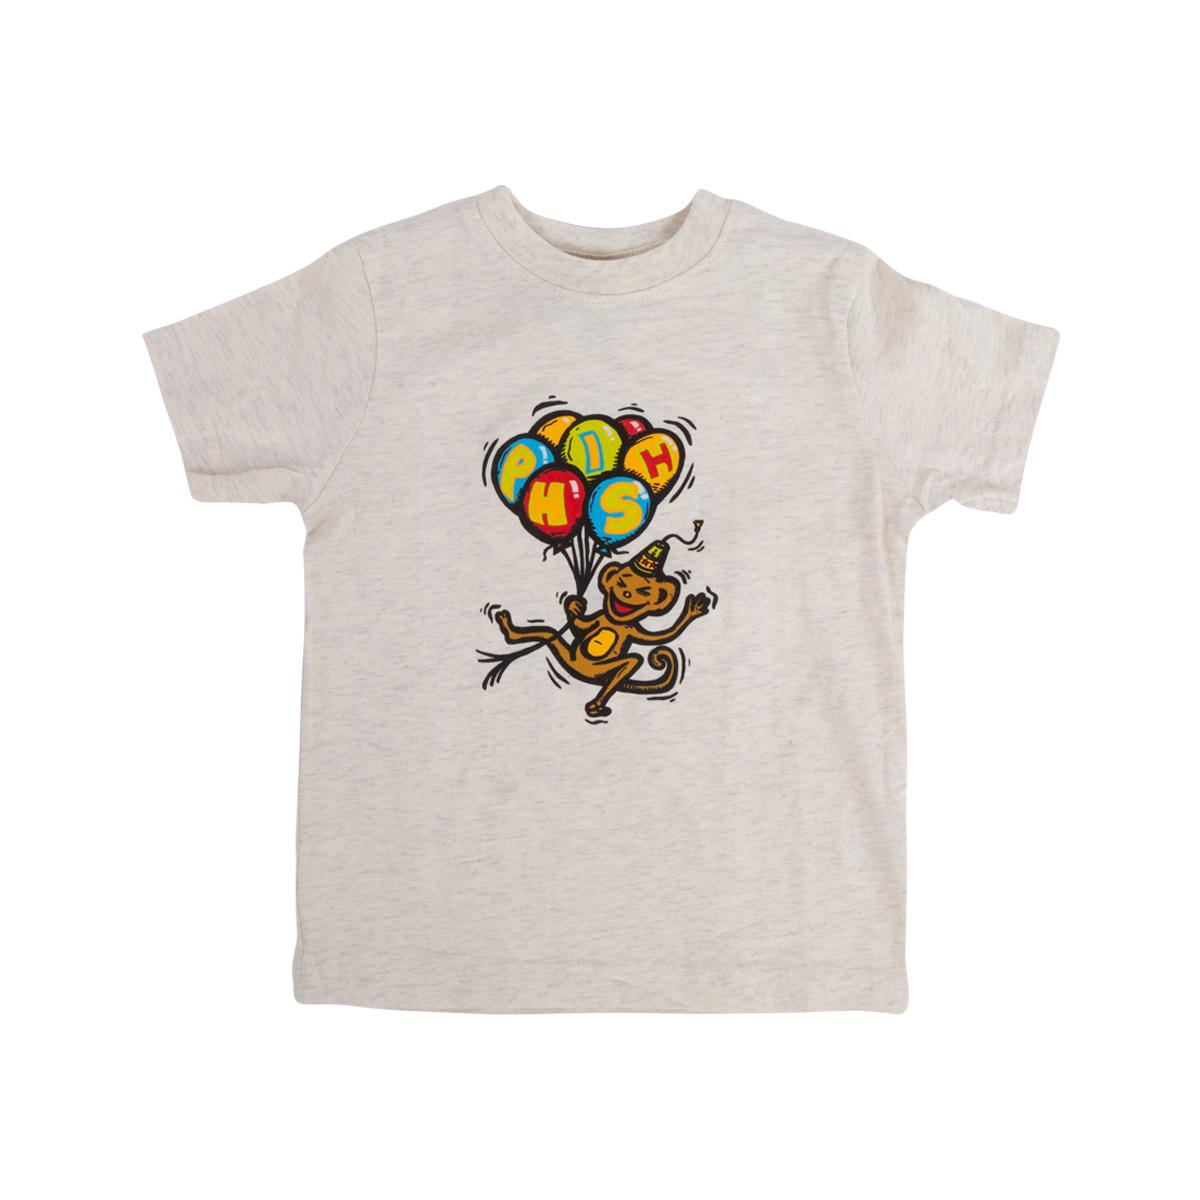 Phish Toddler Monkey T